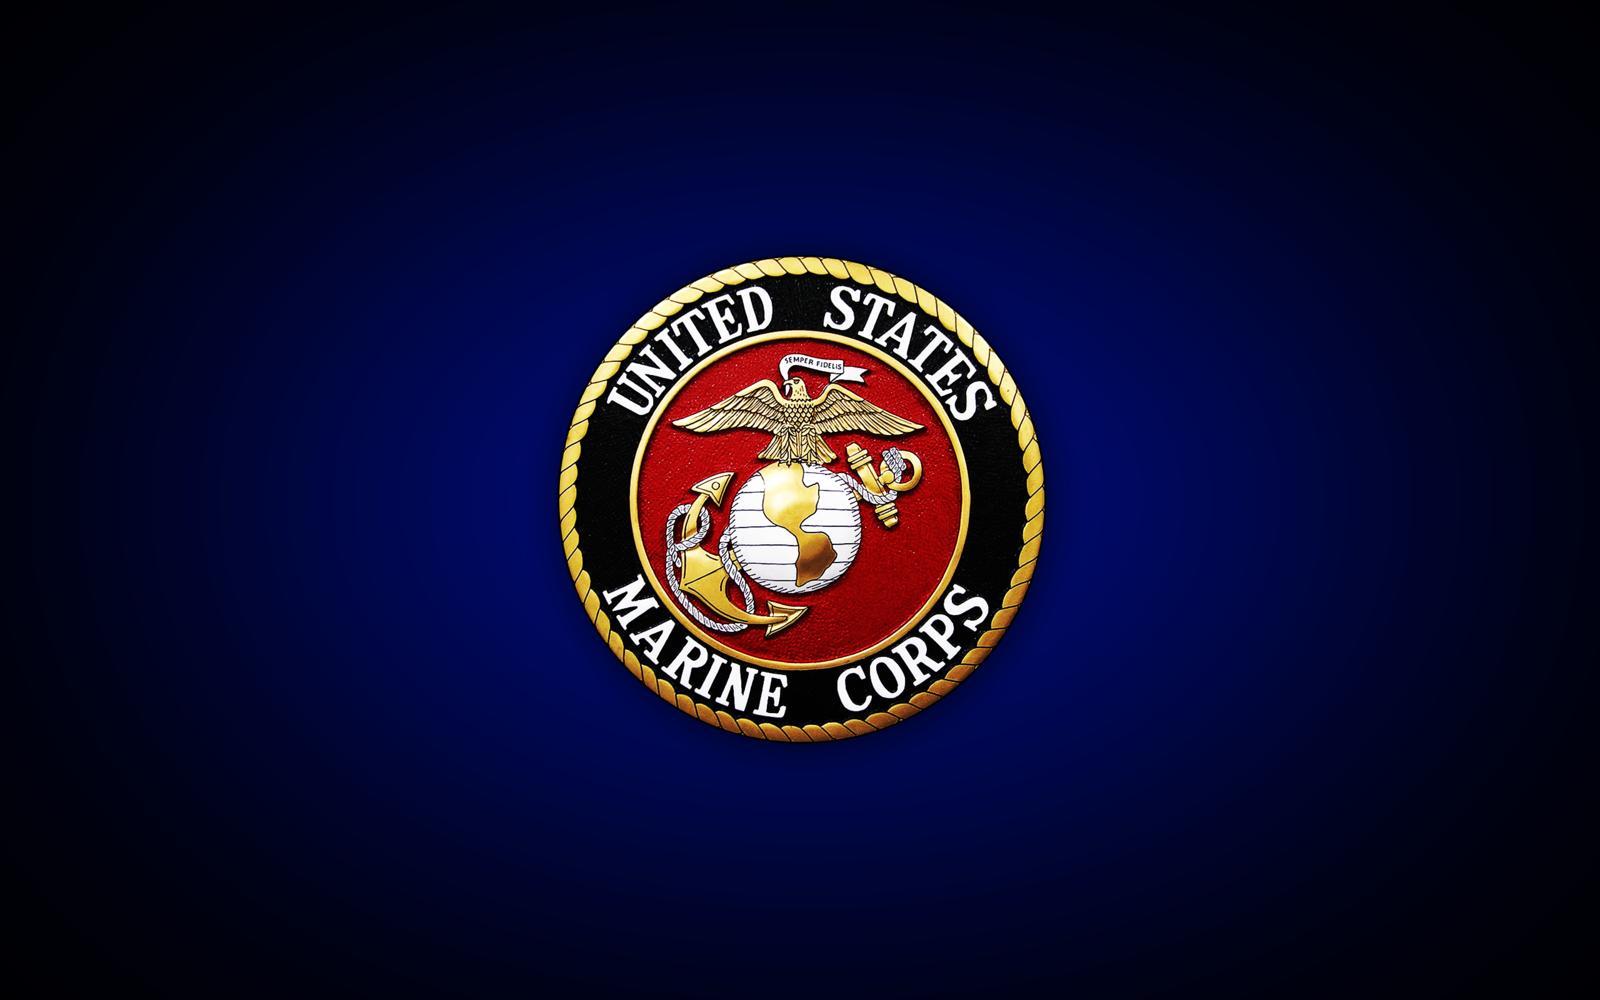 USMC United States Marine Corps Wallpaper by andrewlabrador on 1600x1000